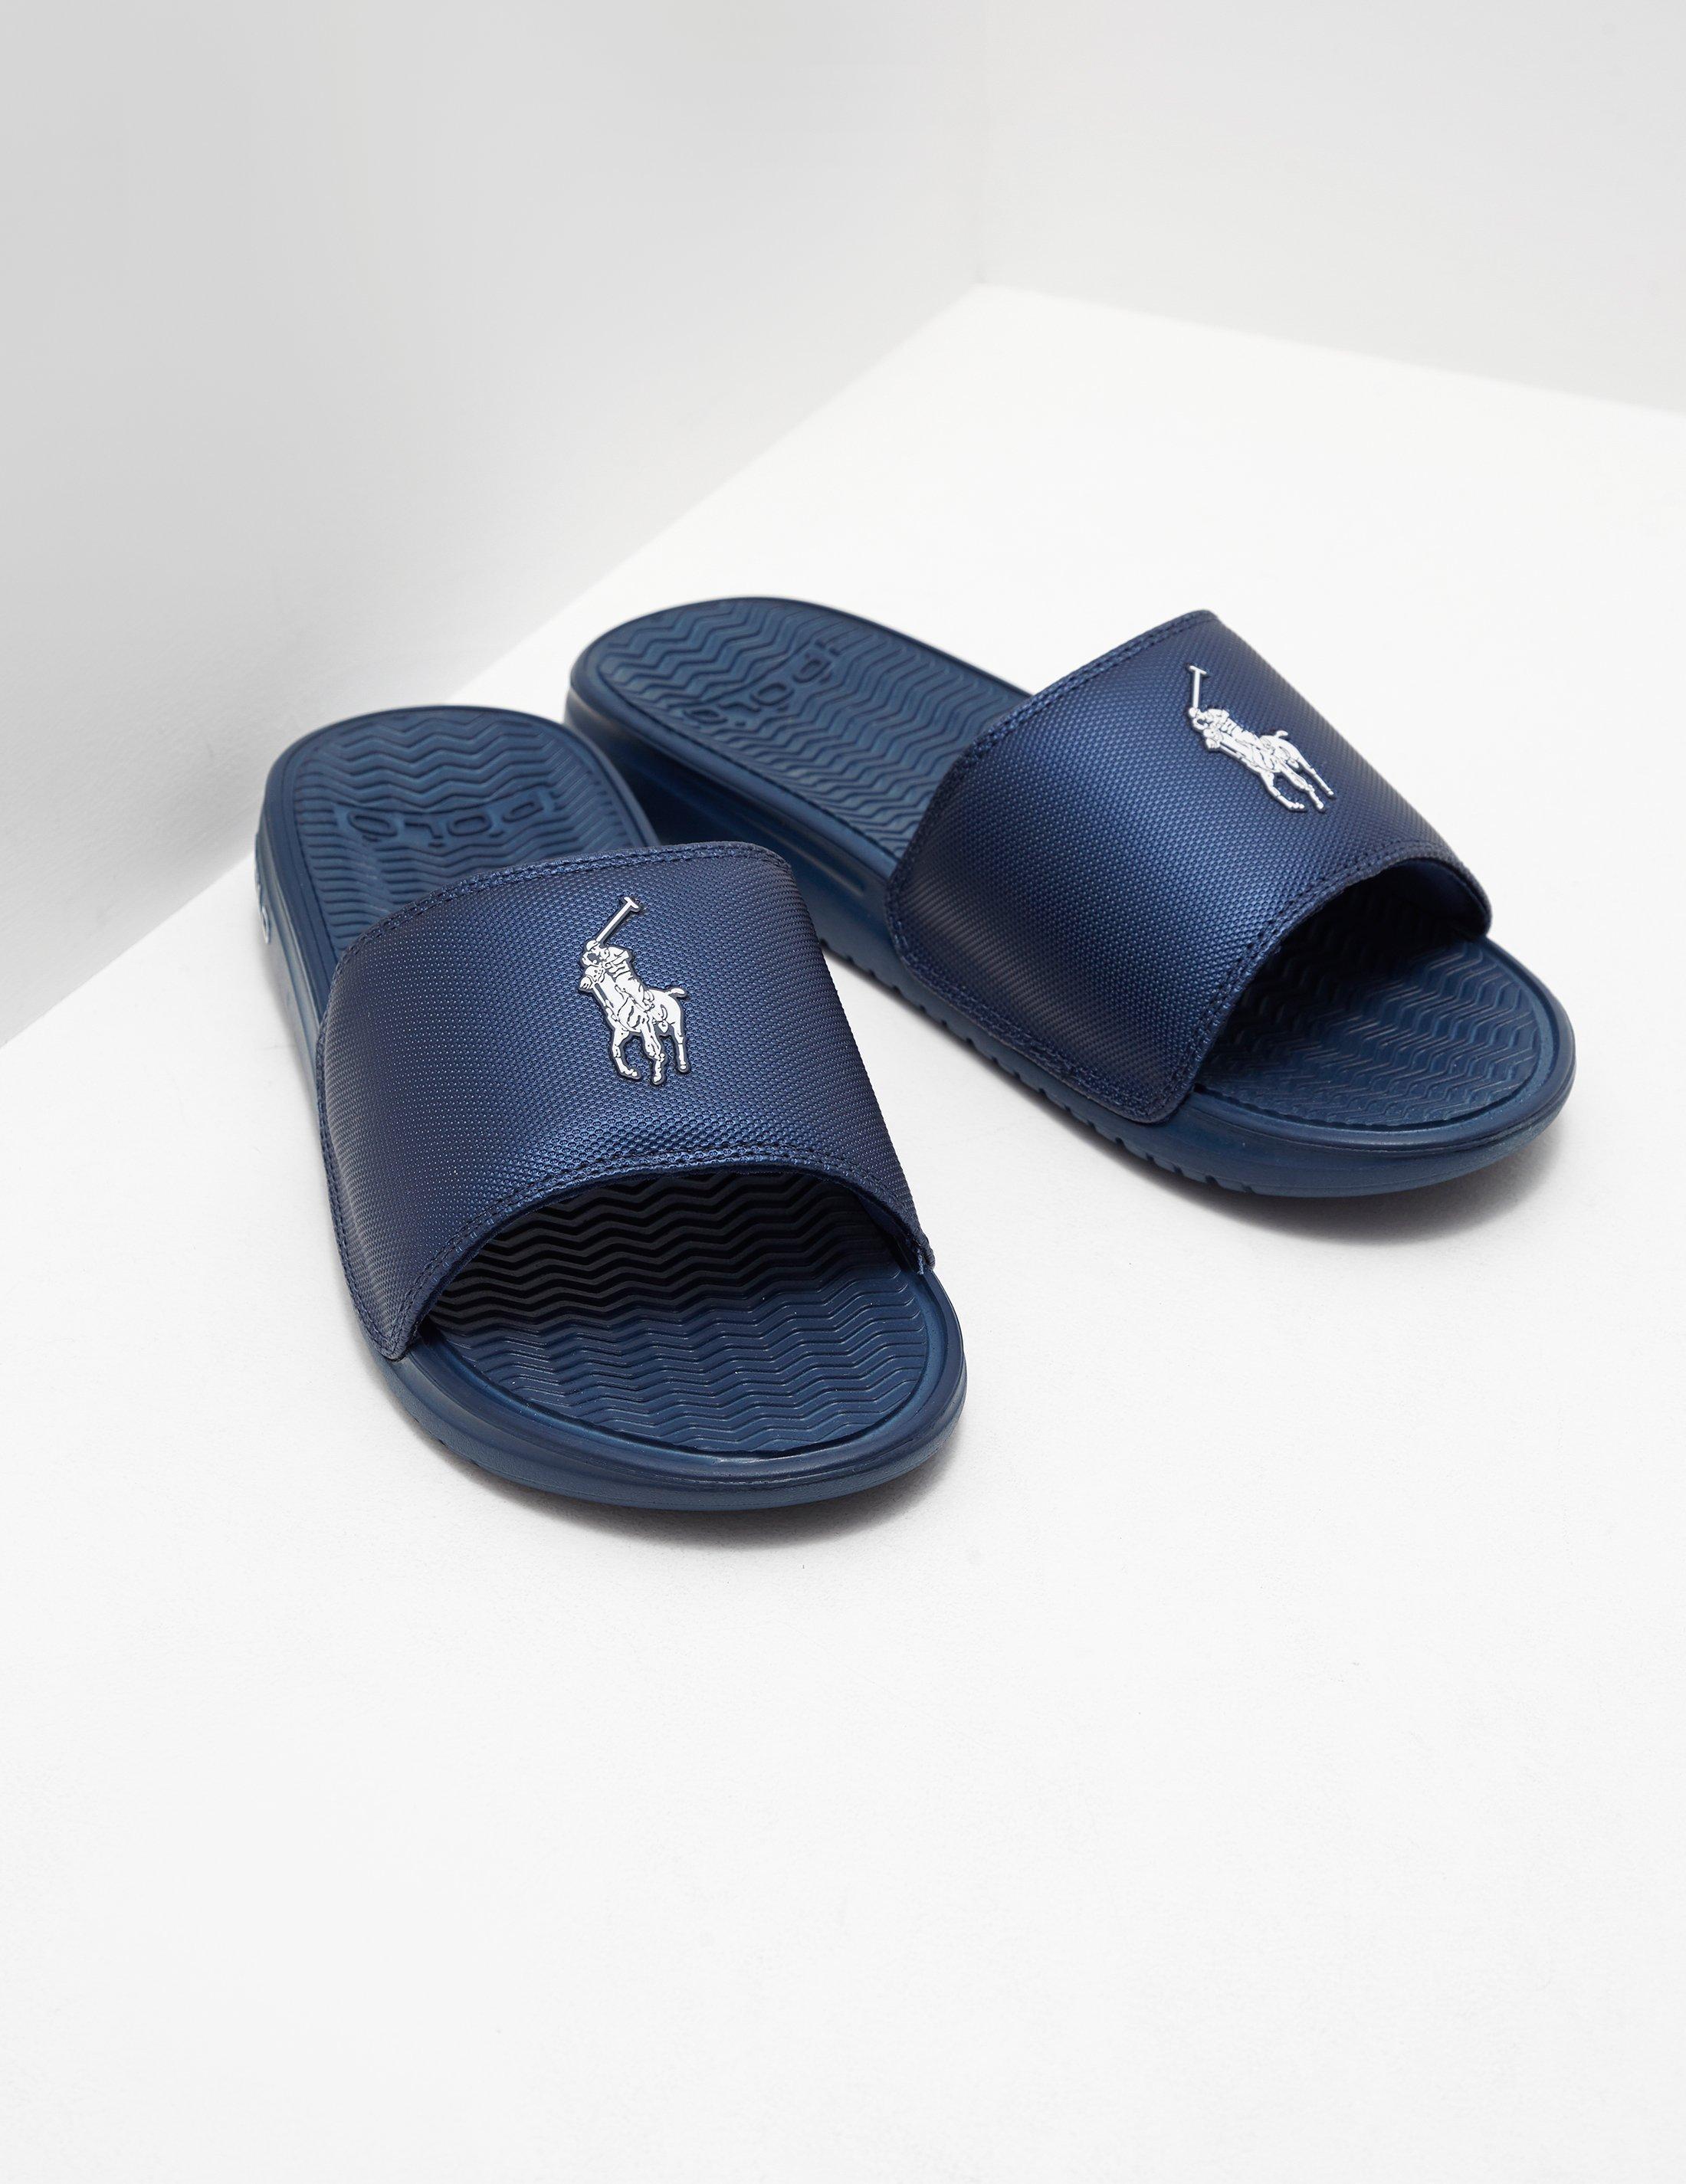 18af0785aaef Polo Ralph Lauren Rodwell Slide Sandal in Blue for Men - Save 43% - Lyst